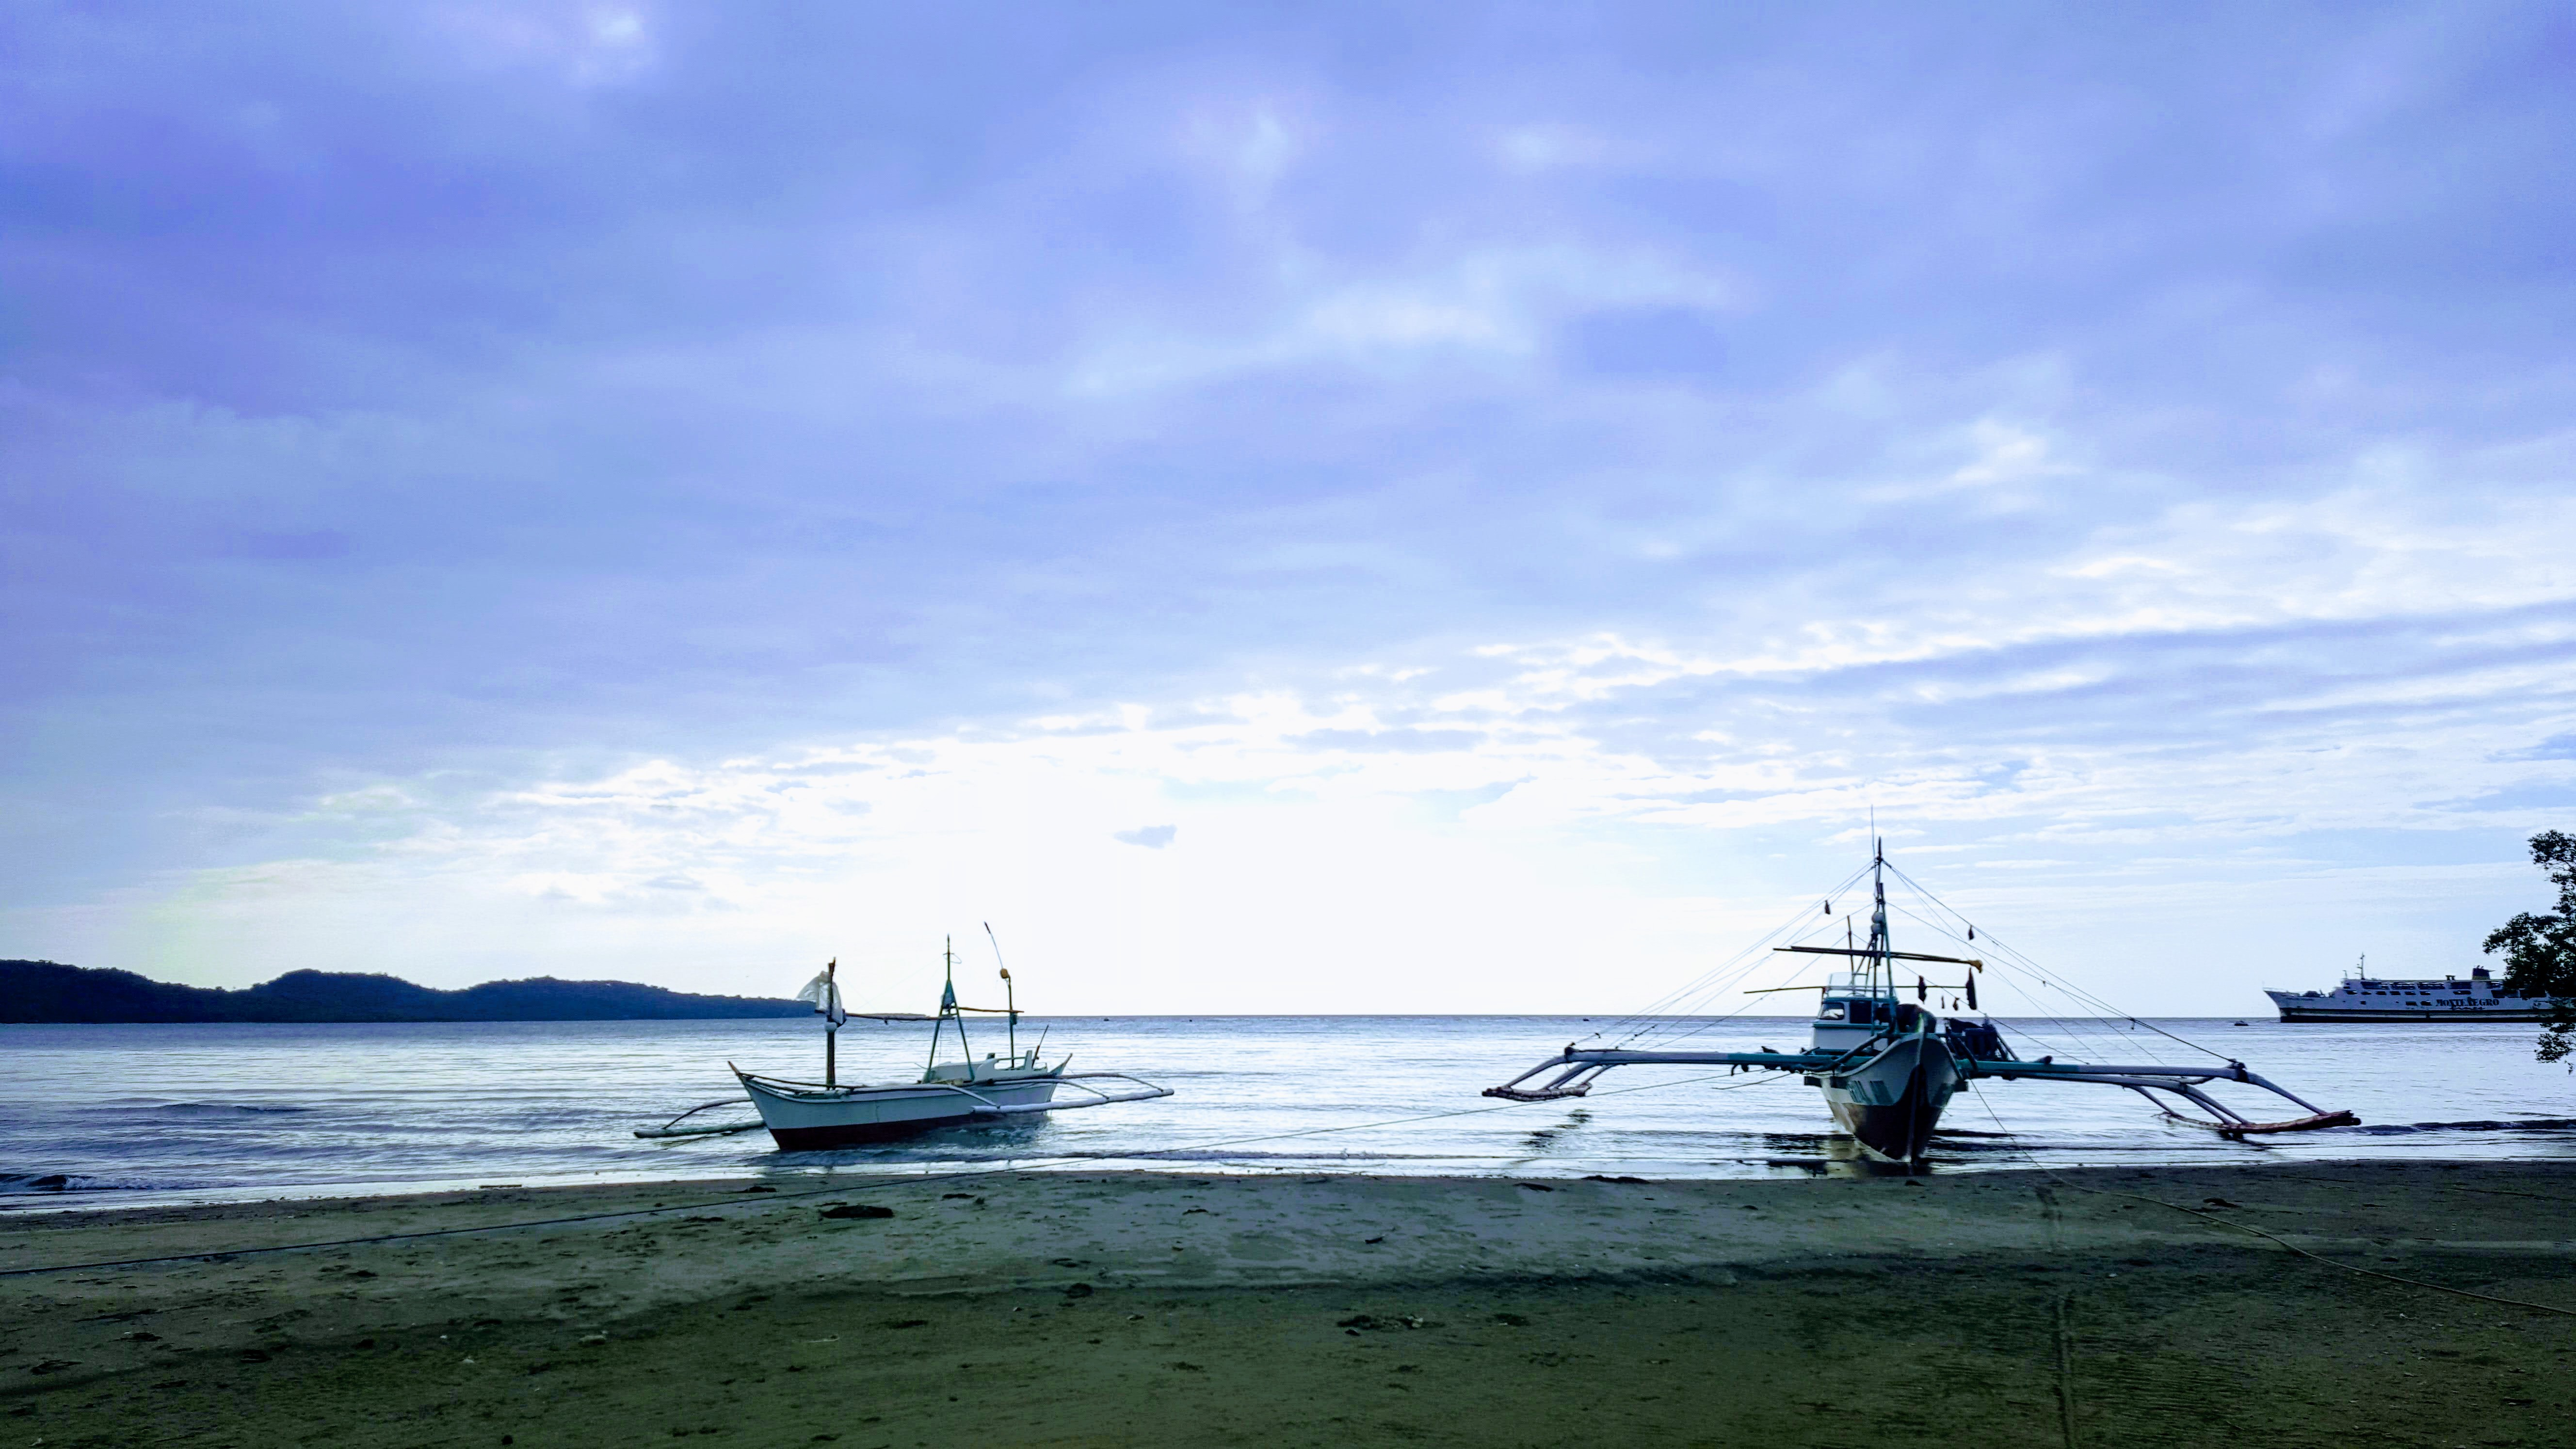 Boats on the shoreline